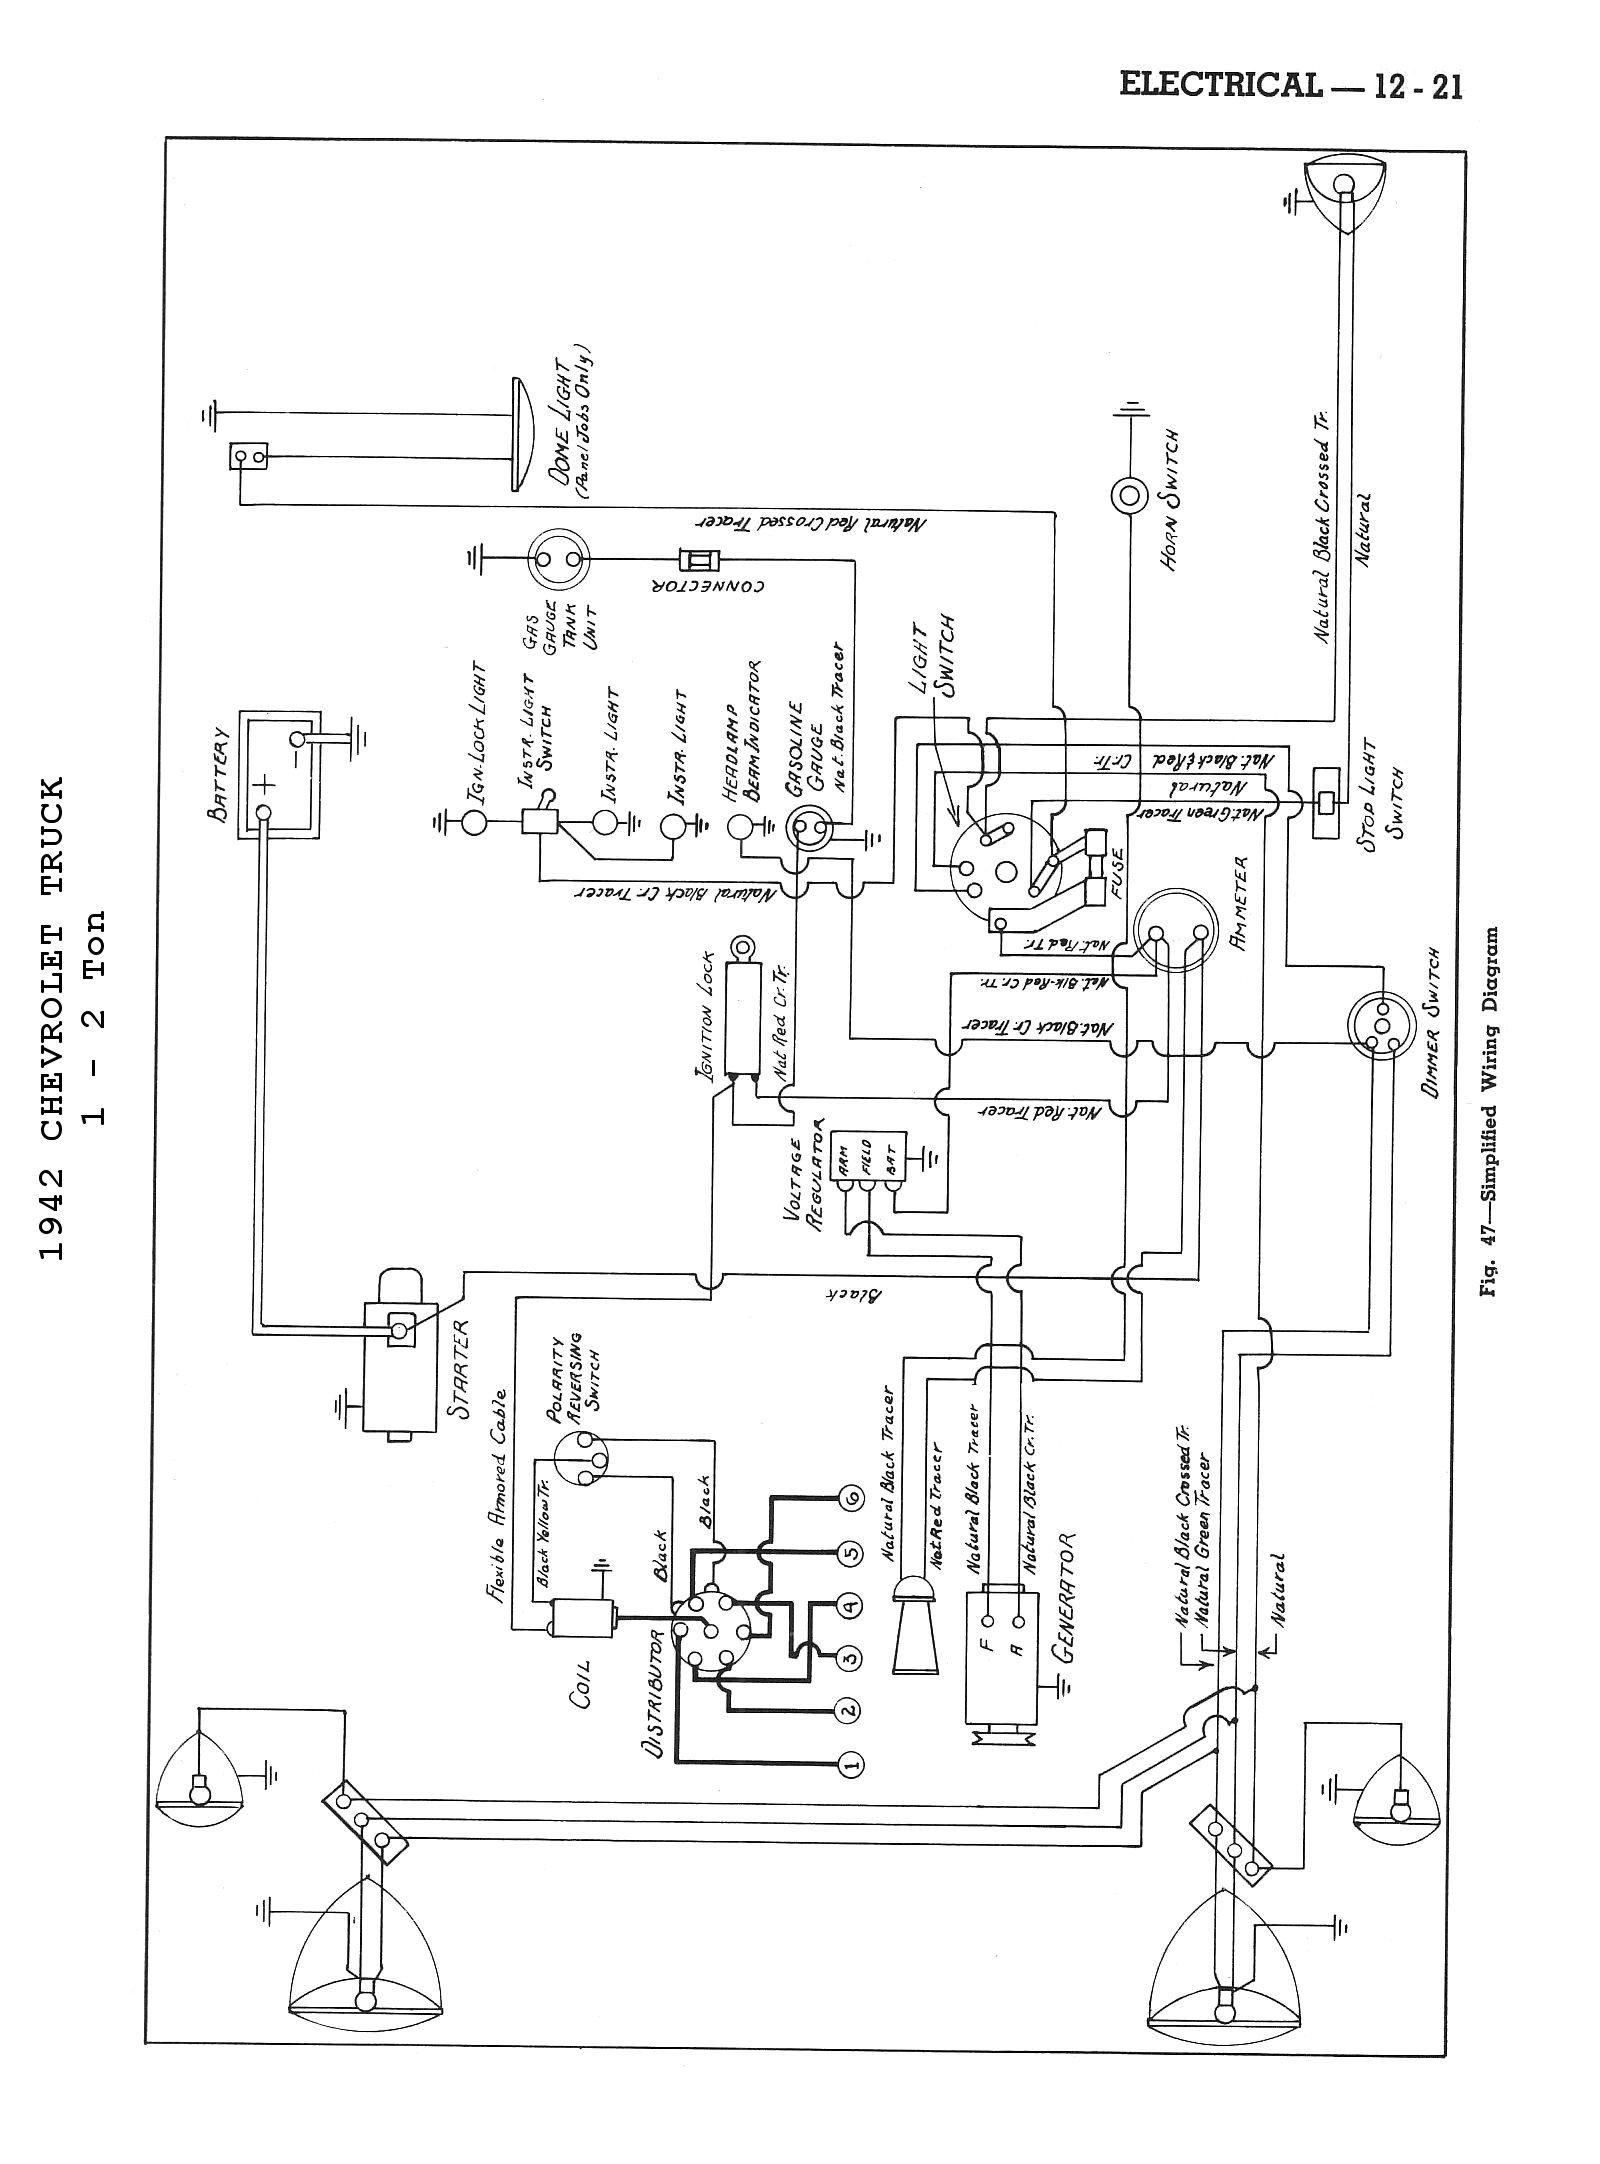 1946 Chevy Pickup Ignition Wiring Diagram Schematic